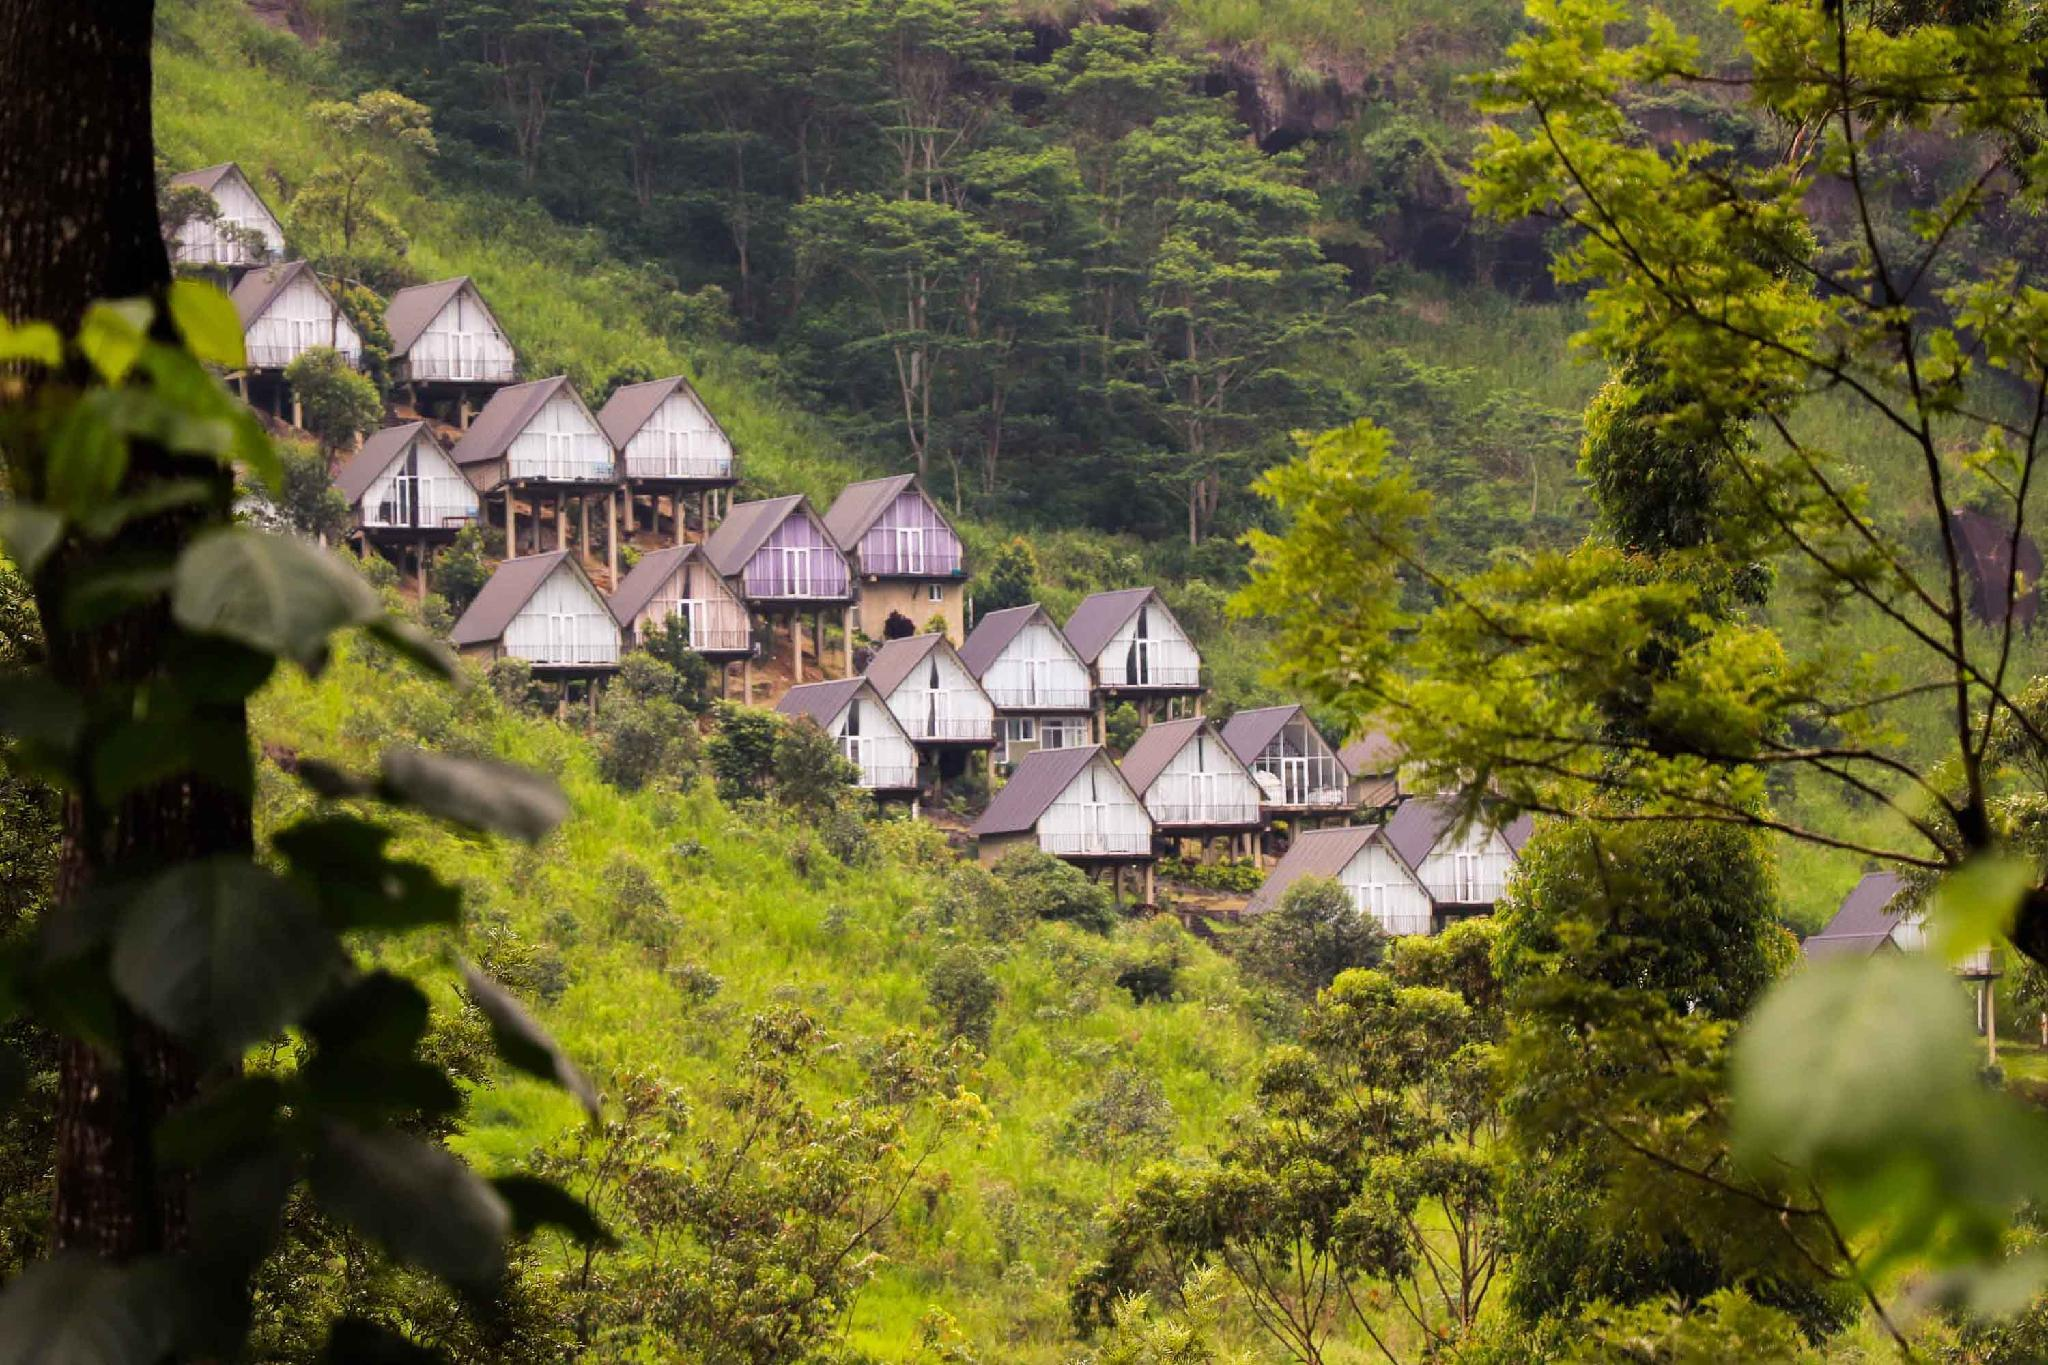 The Waterfall Villas